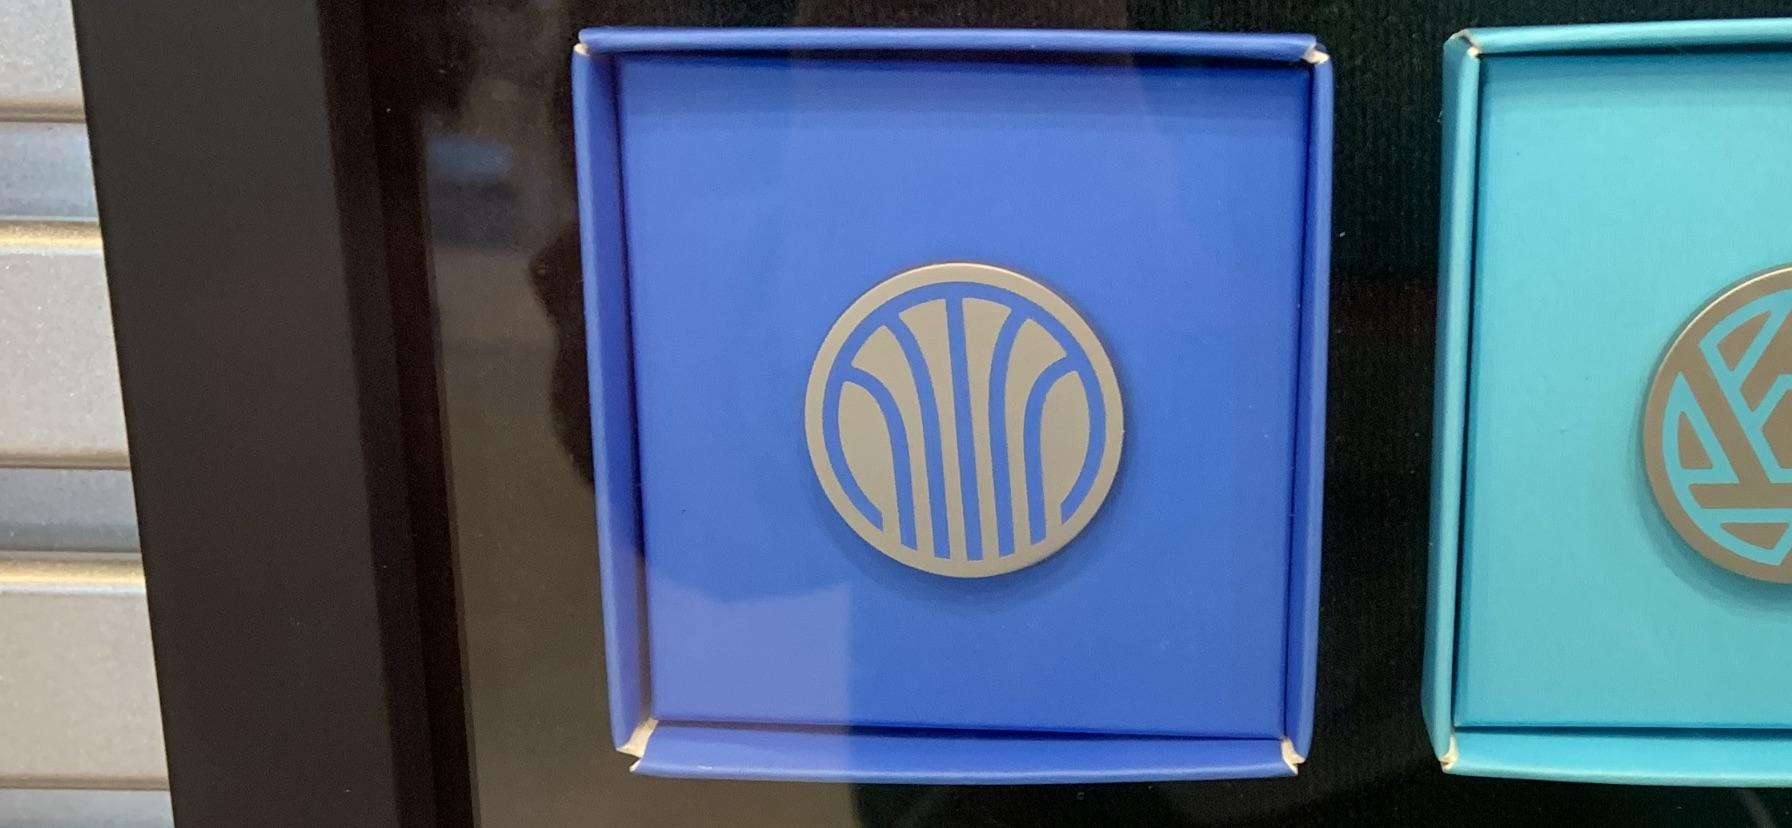 EPCOT pavilion logo pins 12/23/19 16